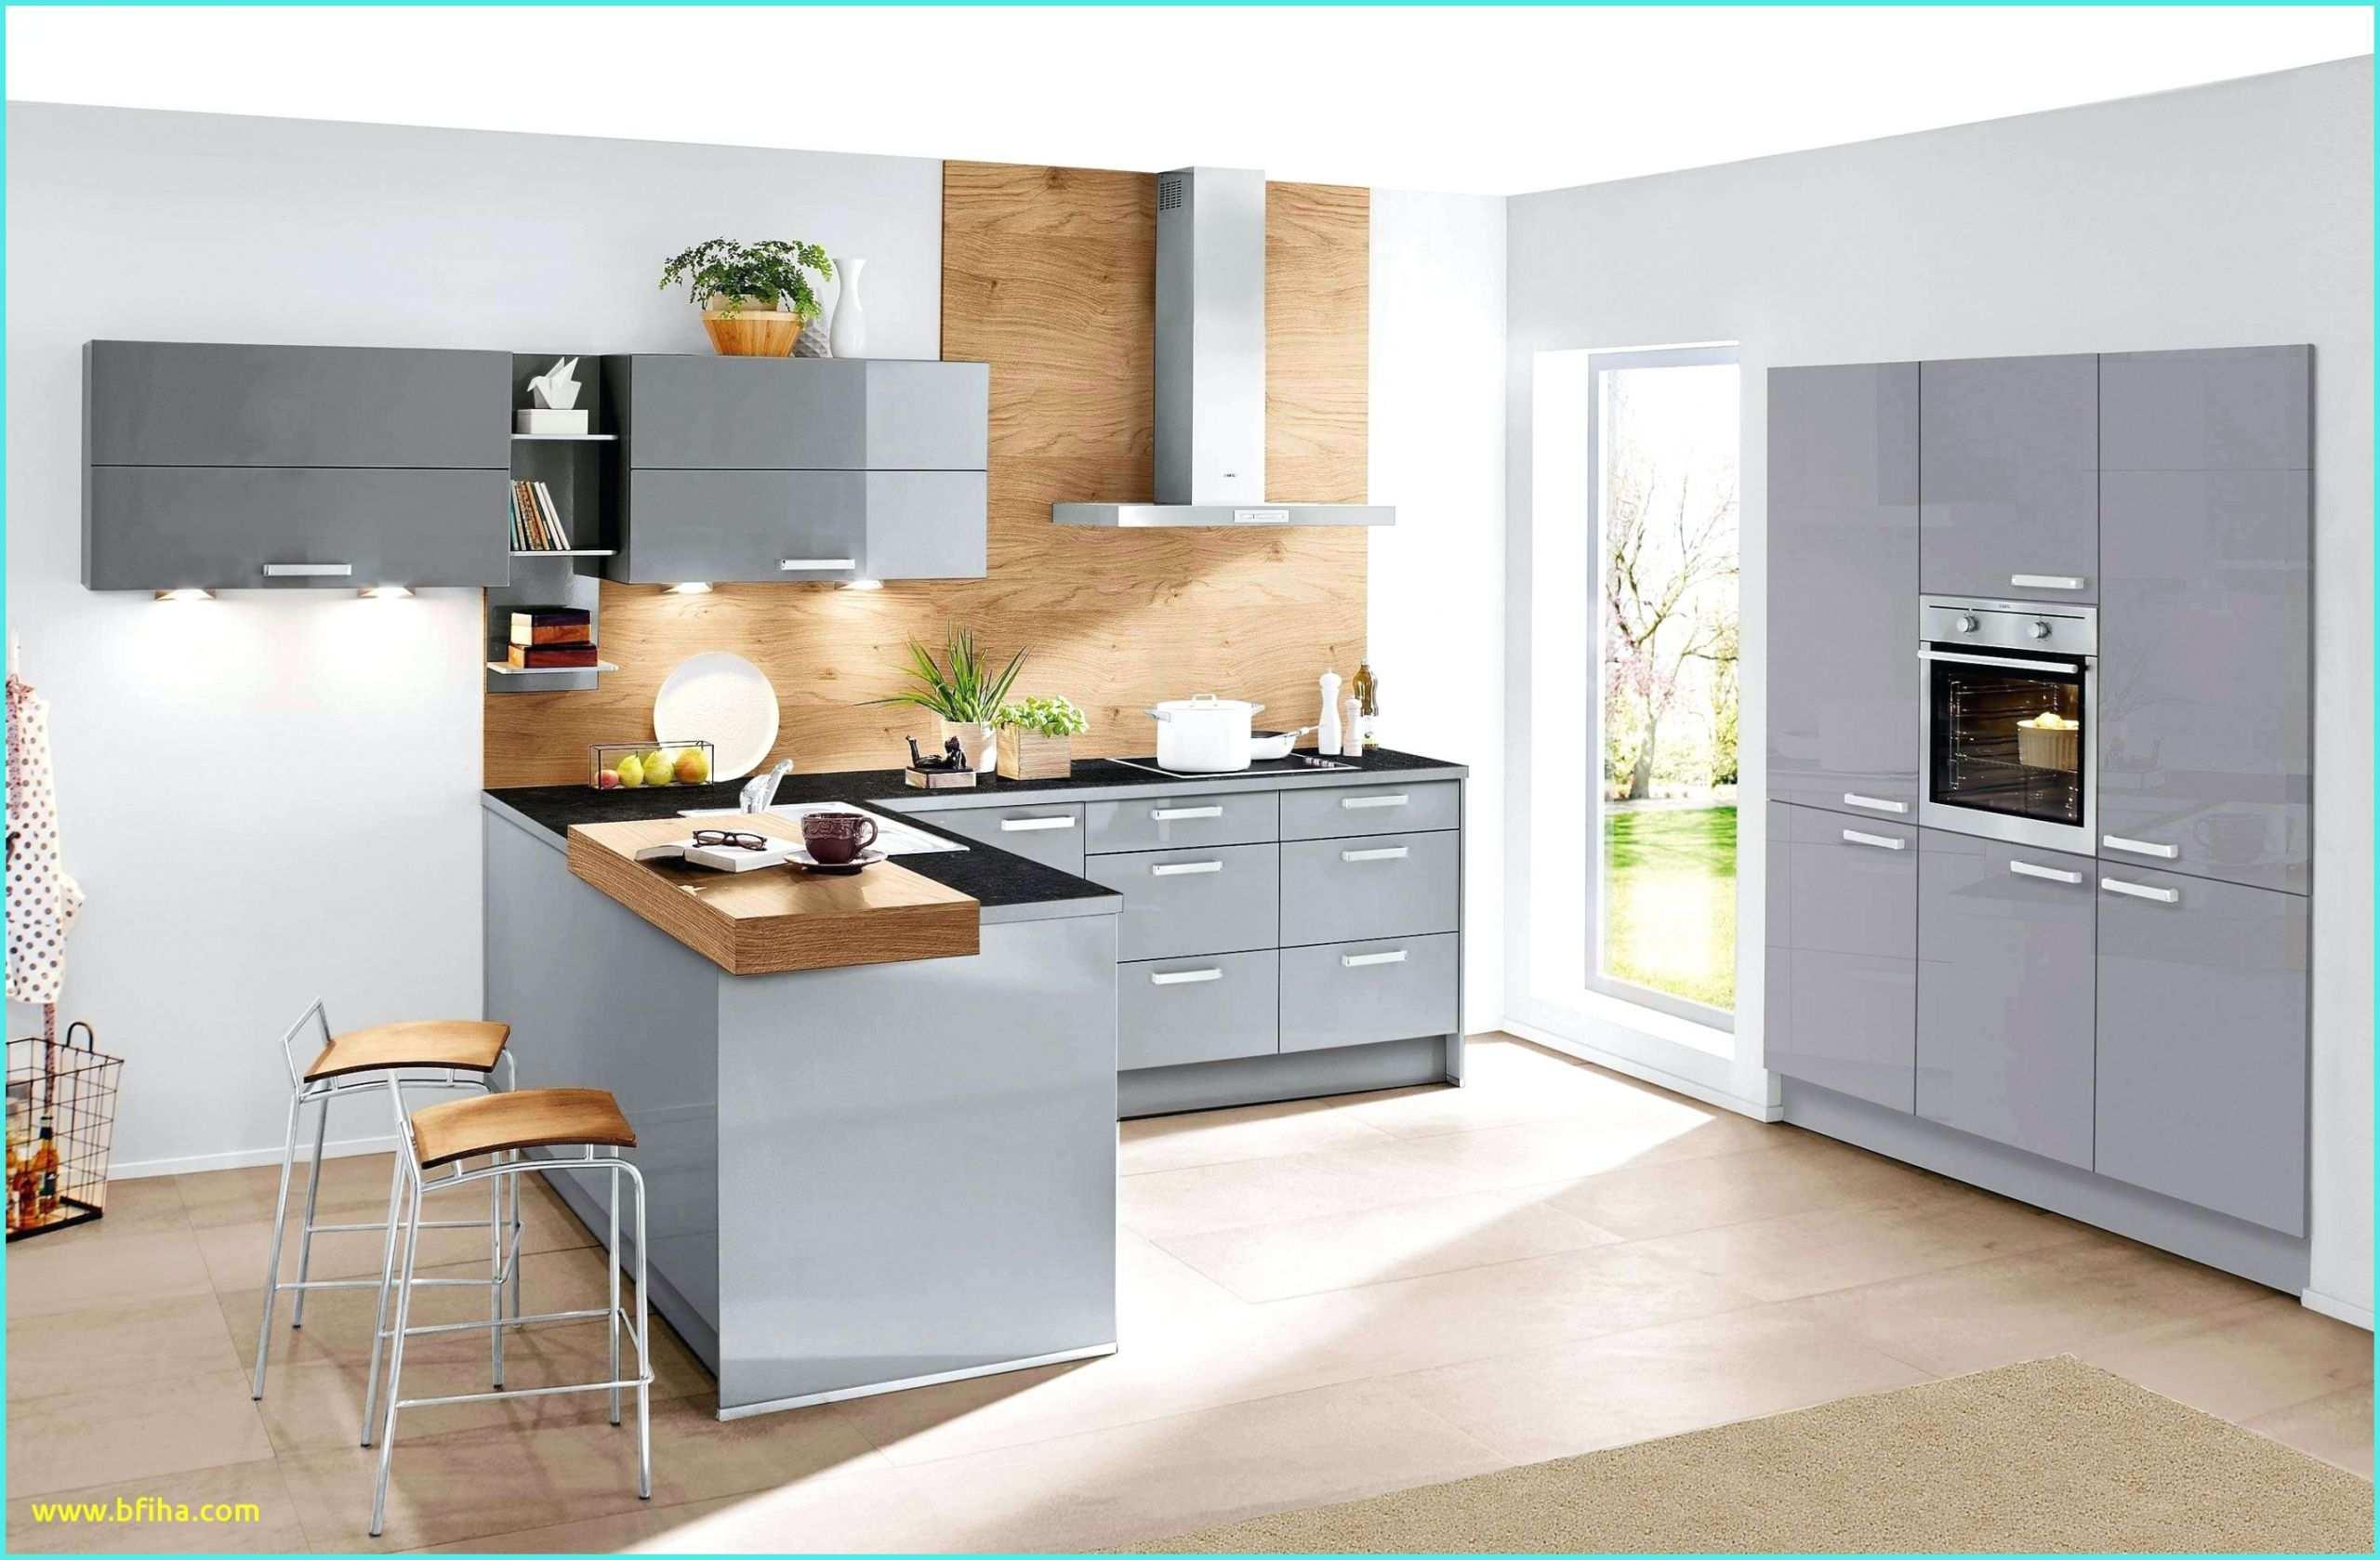 Full Size of Mömax Küche Planen Individuelle Küche Planen Küche Planen Online Mit Preis Küche Planen App Android Küche Küche Planen